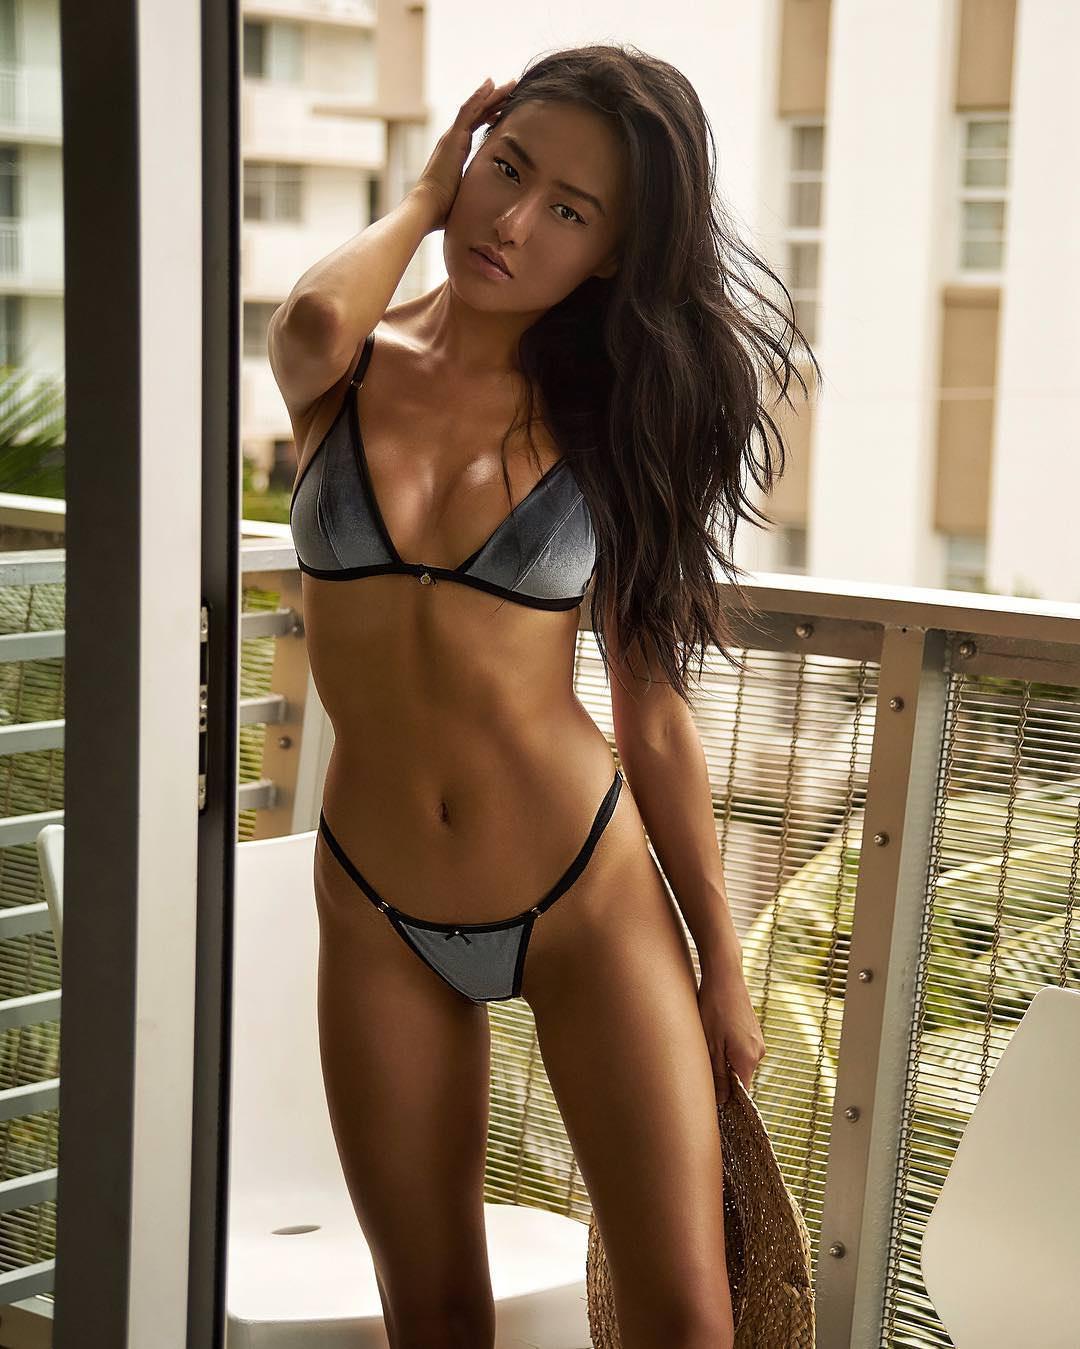 Anna xiao model nude